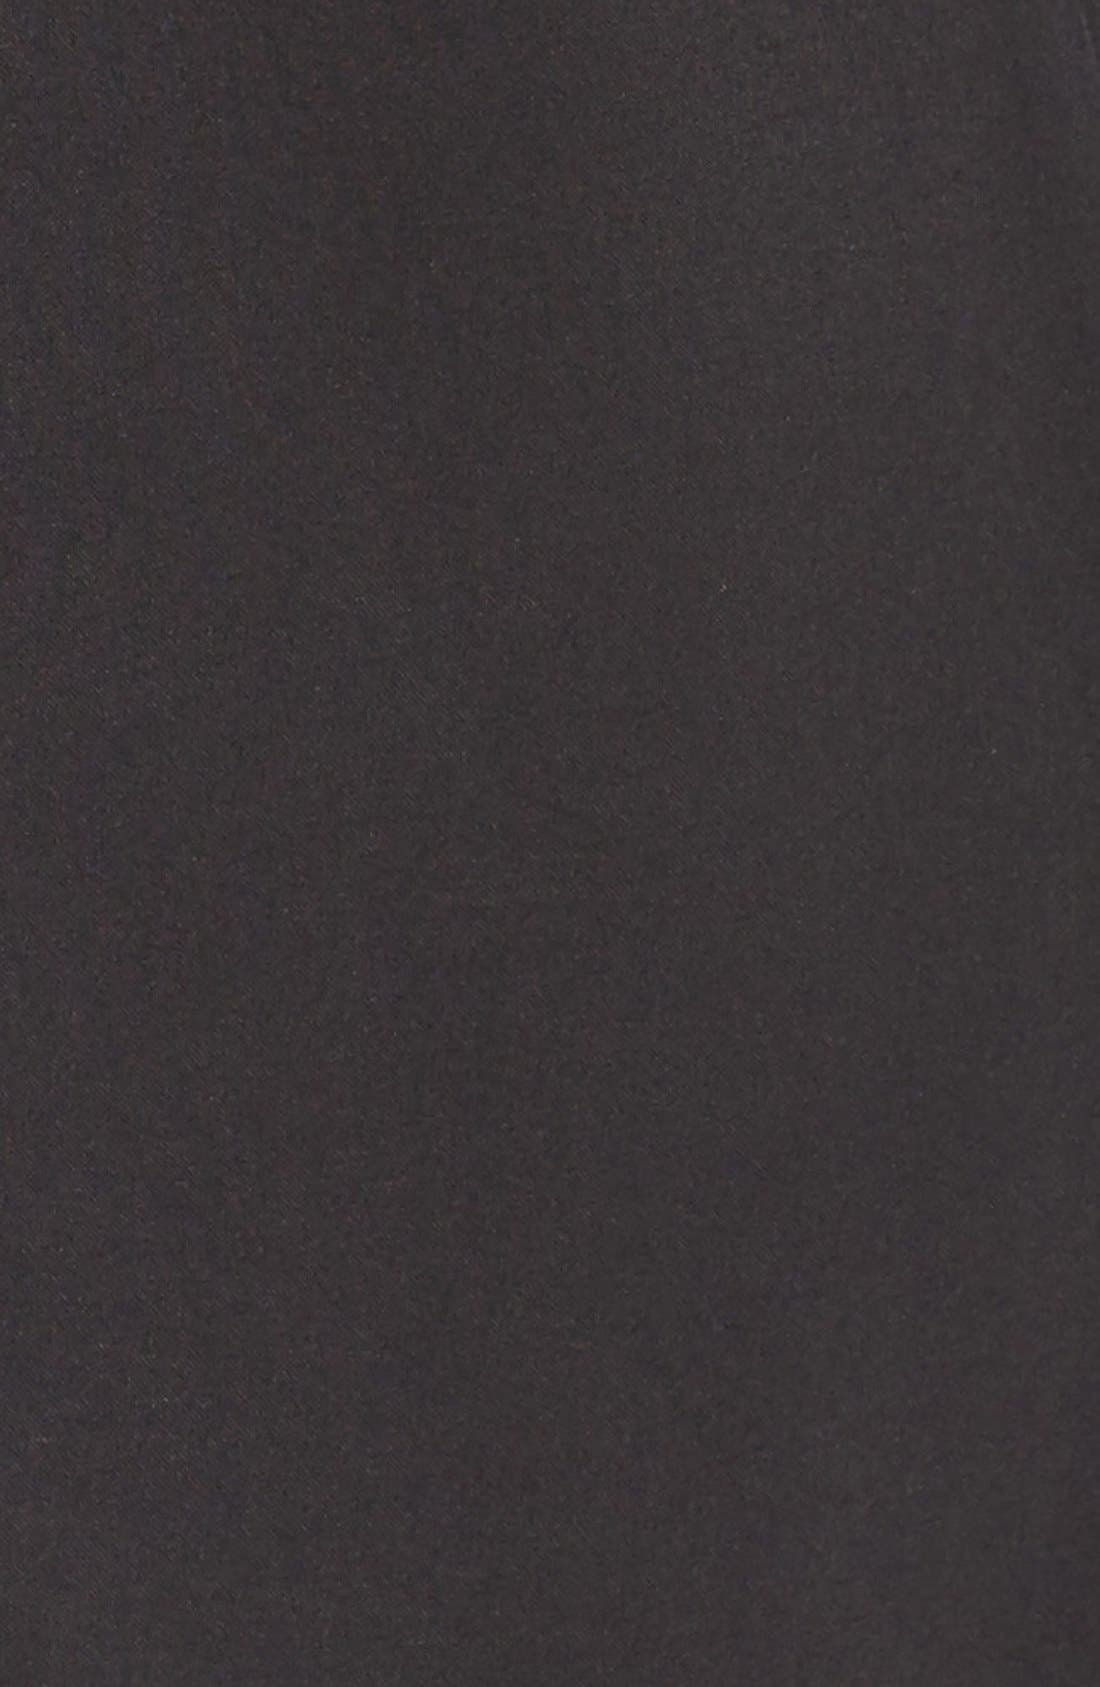 Apex Bionic Grace Jacket,                             Alternate thumbnail 11, color,                             TNF BLACK